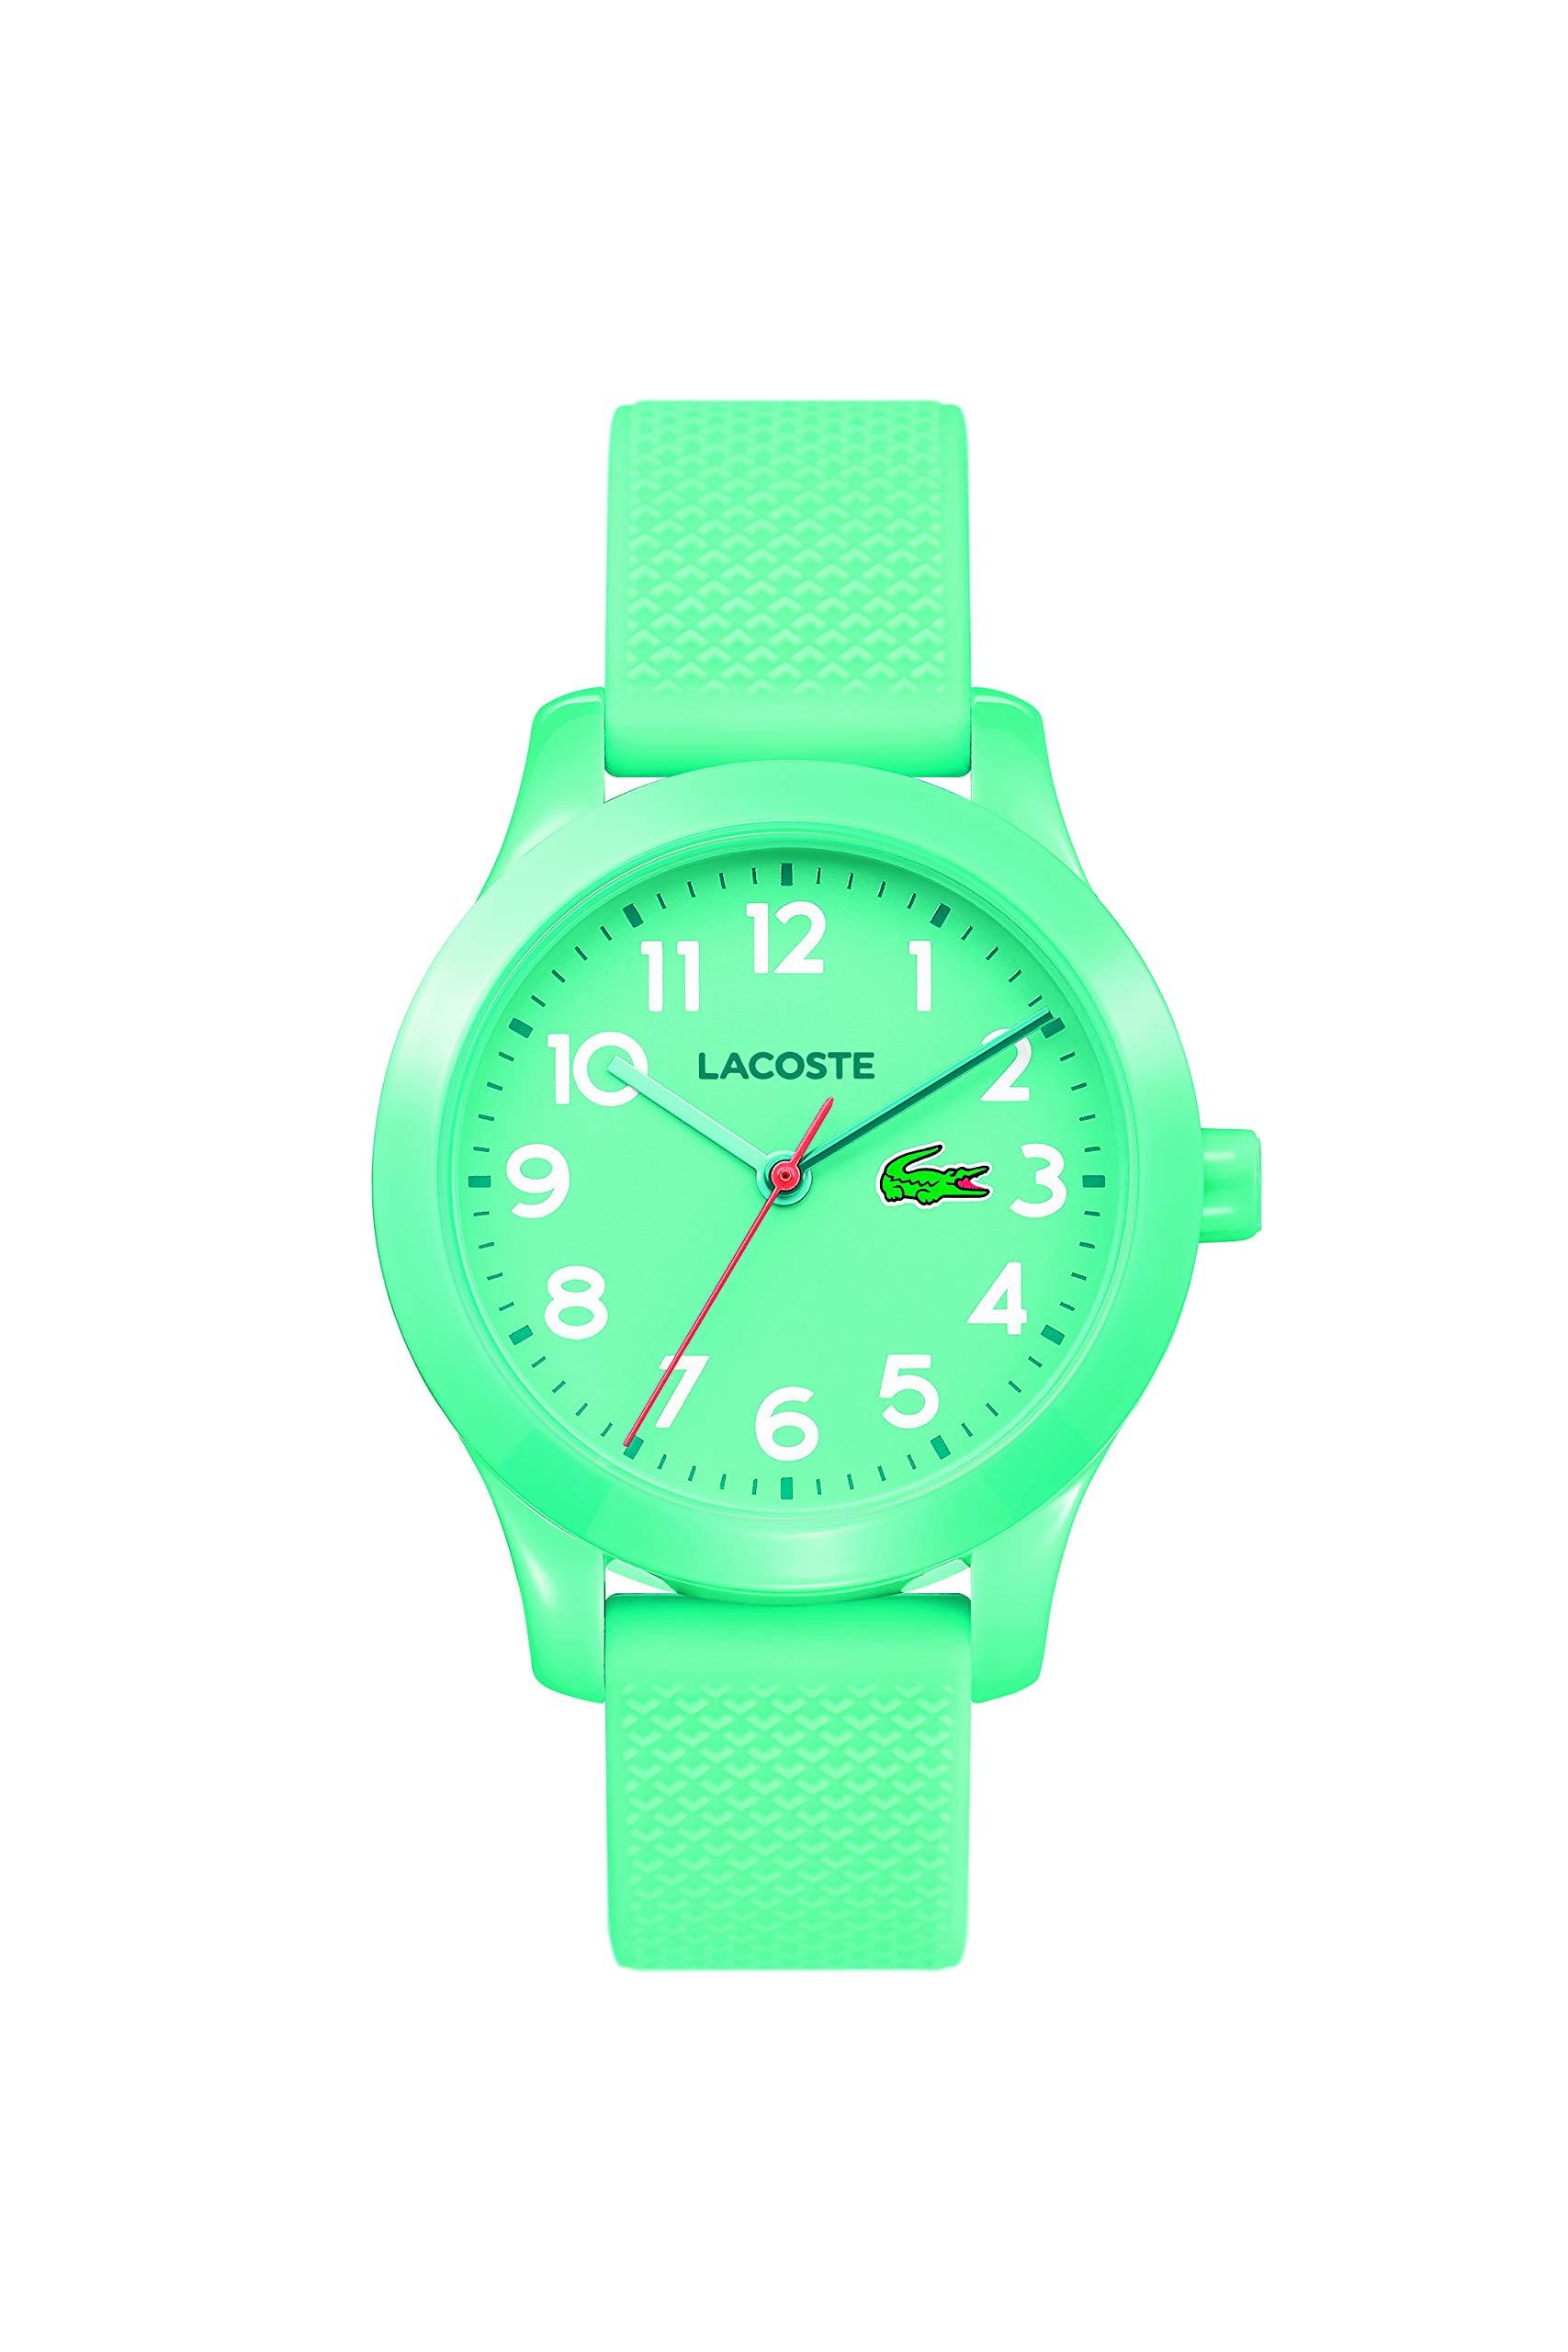 Lacoste Kids' TR90 Quartz Watch with Rubber Strap, Blue, 14 (Model: 2030005) by Lacoste